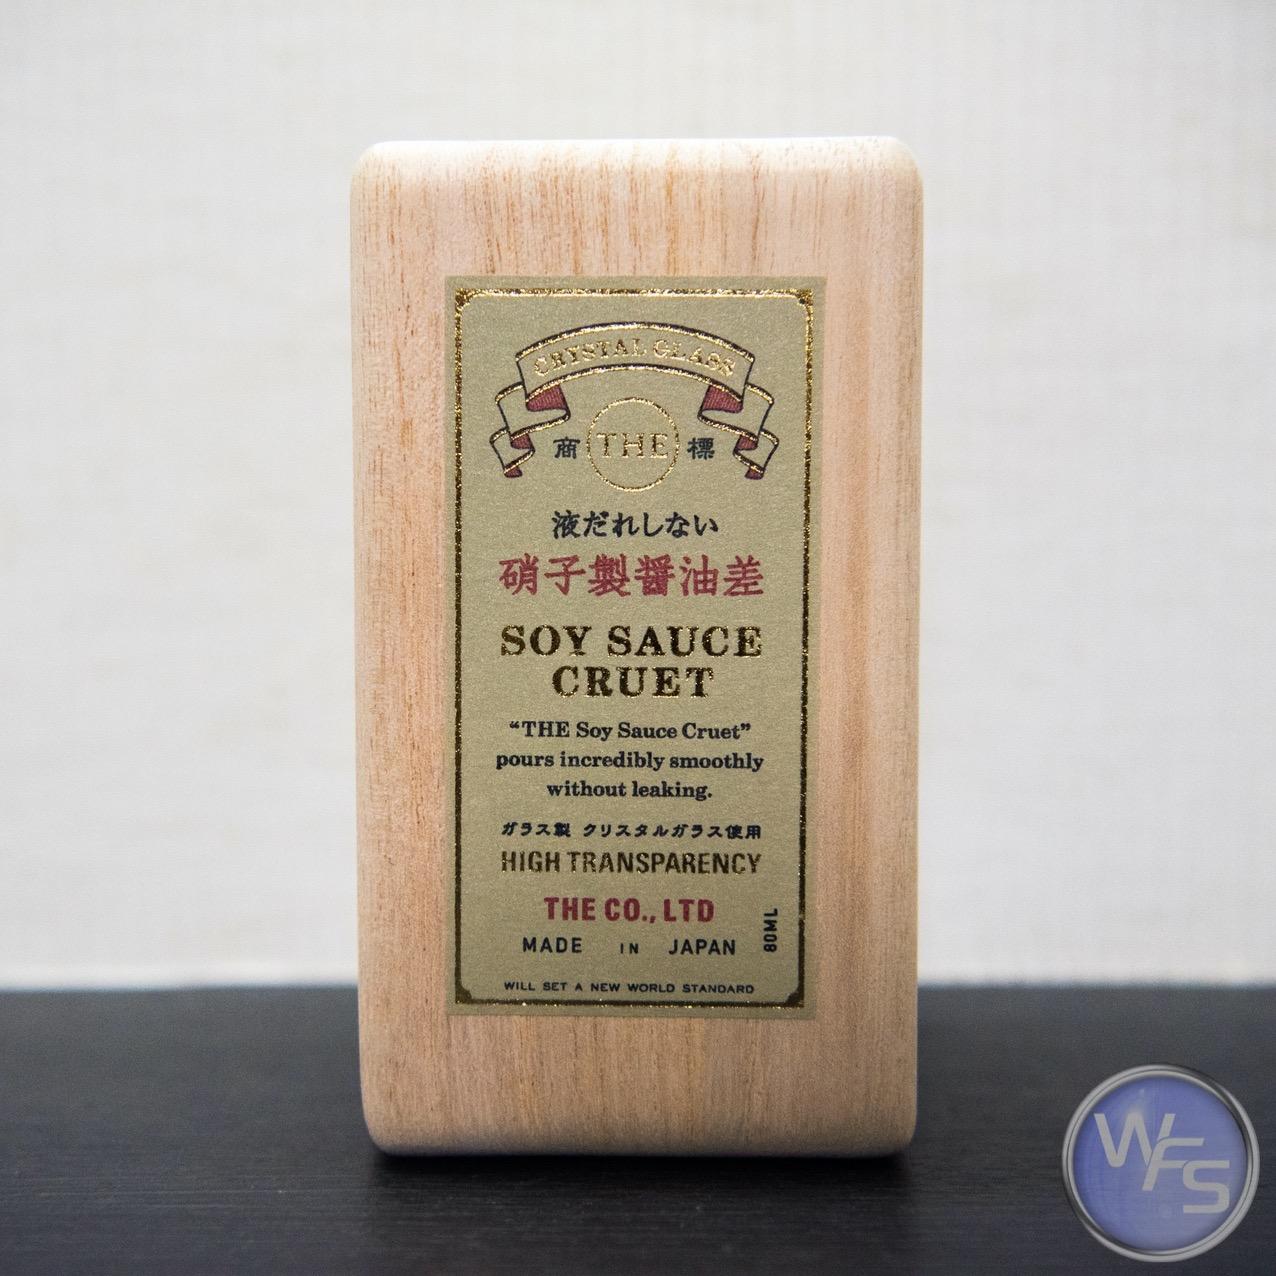 The soy sauce cruet01